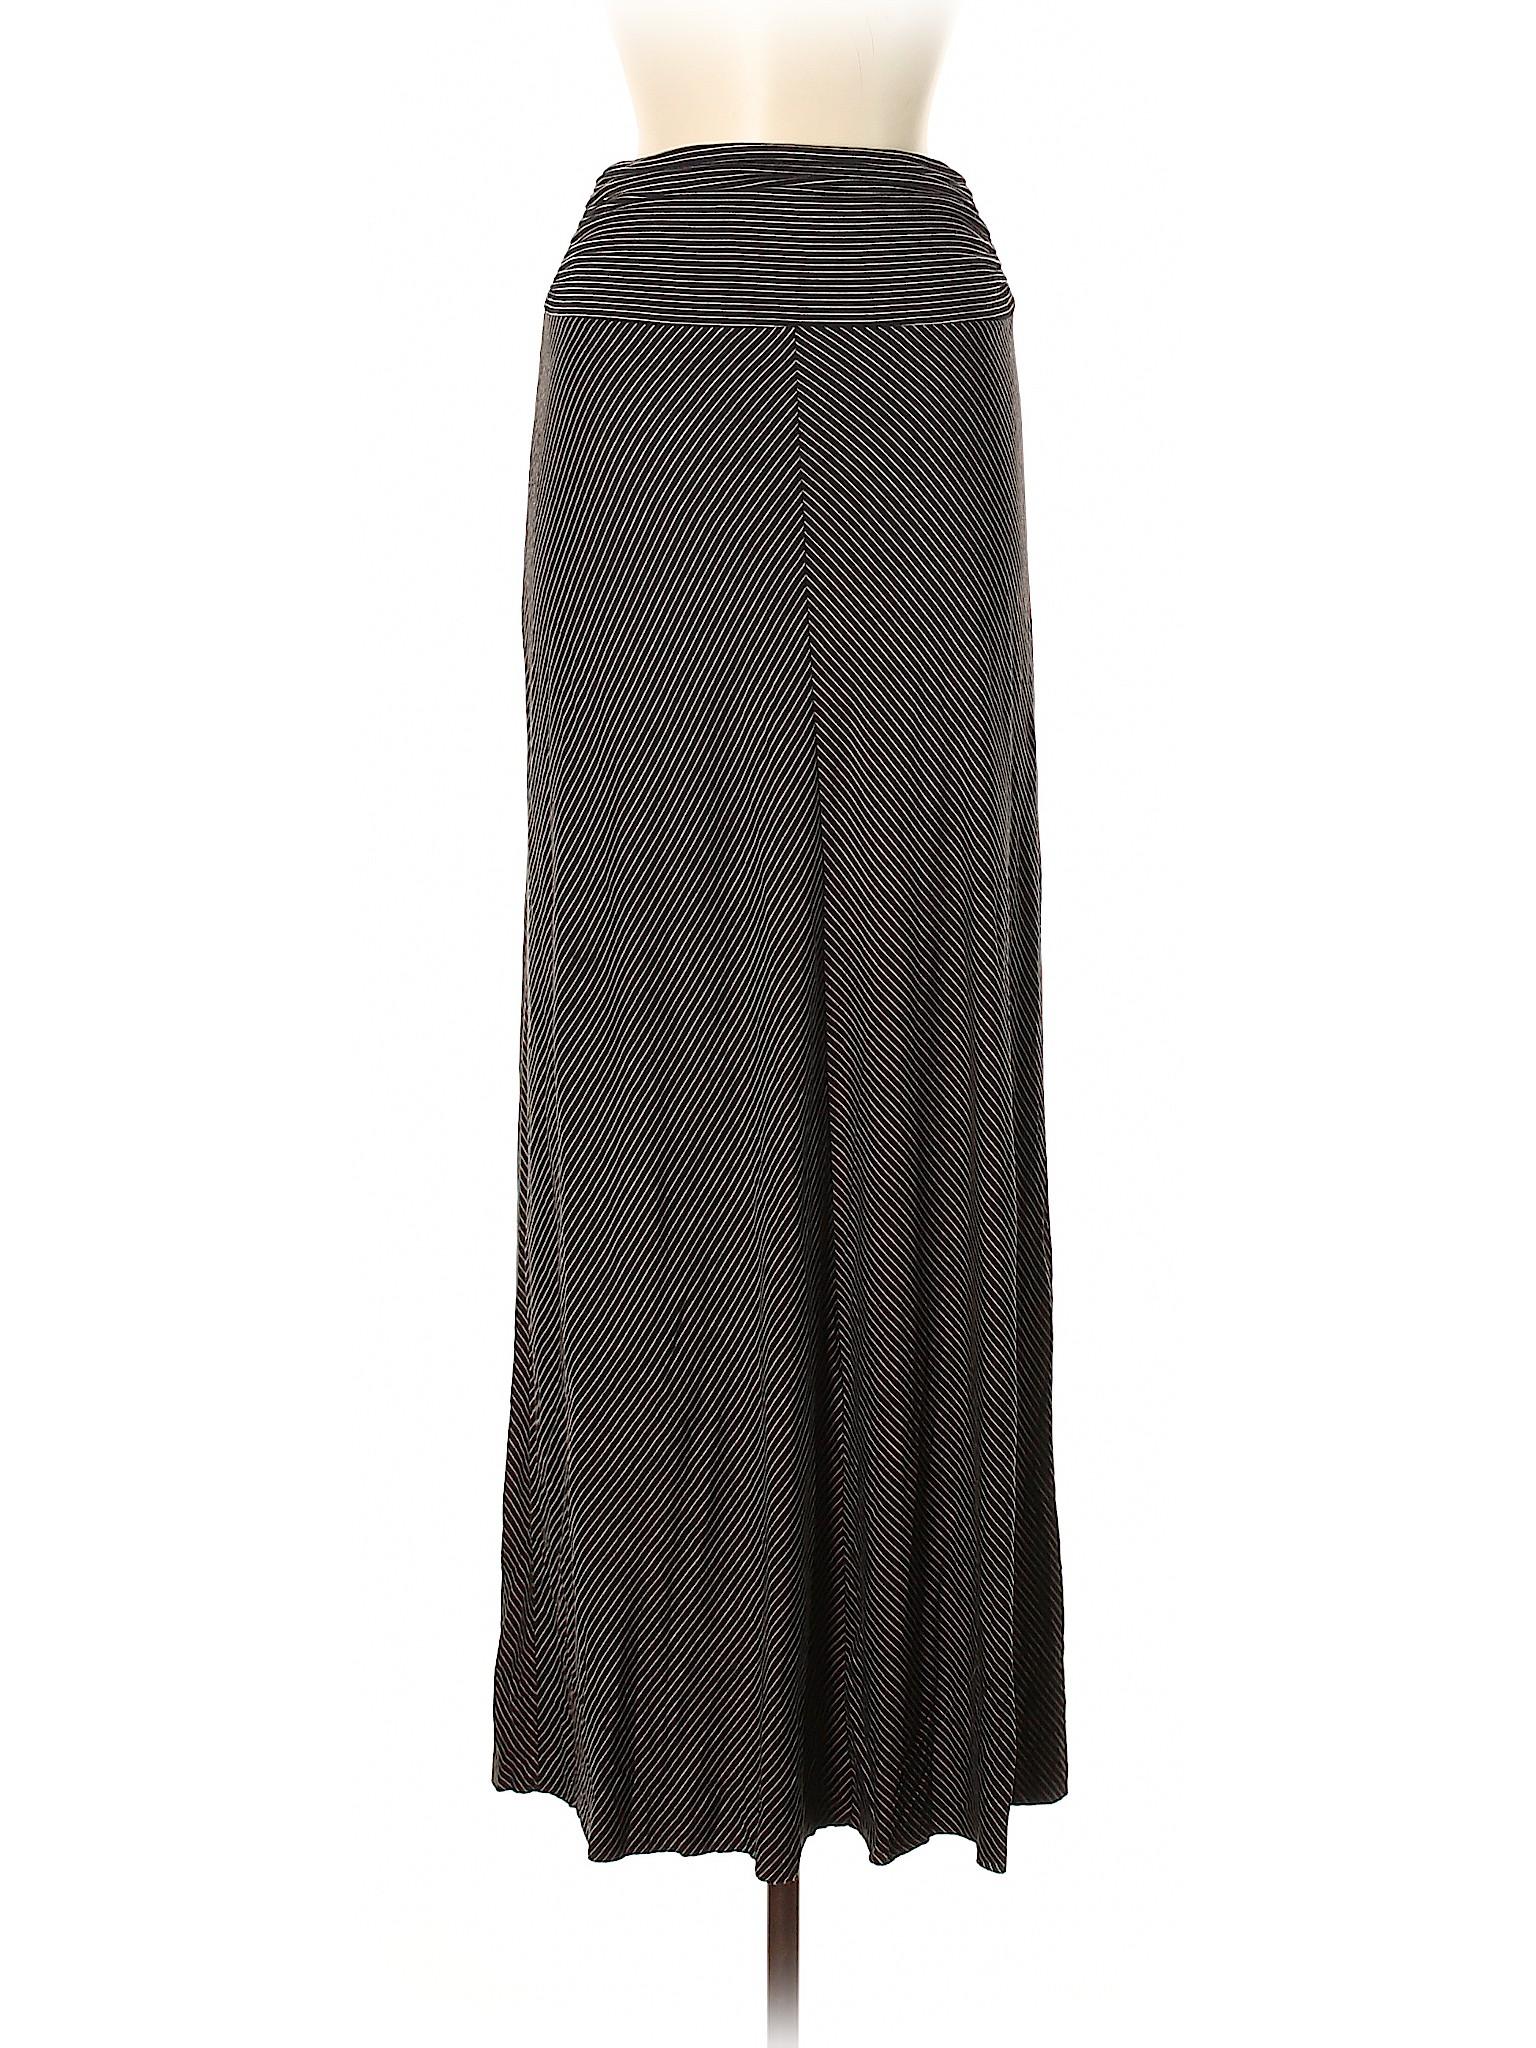 Boutique Casual Boutique Boutique Casual Boutique Casual Skirt Skirt Skirt Casual qIYw7t7